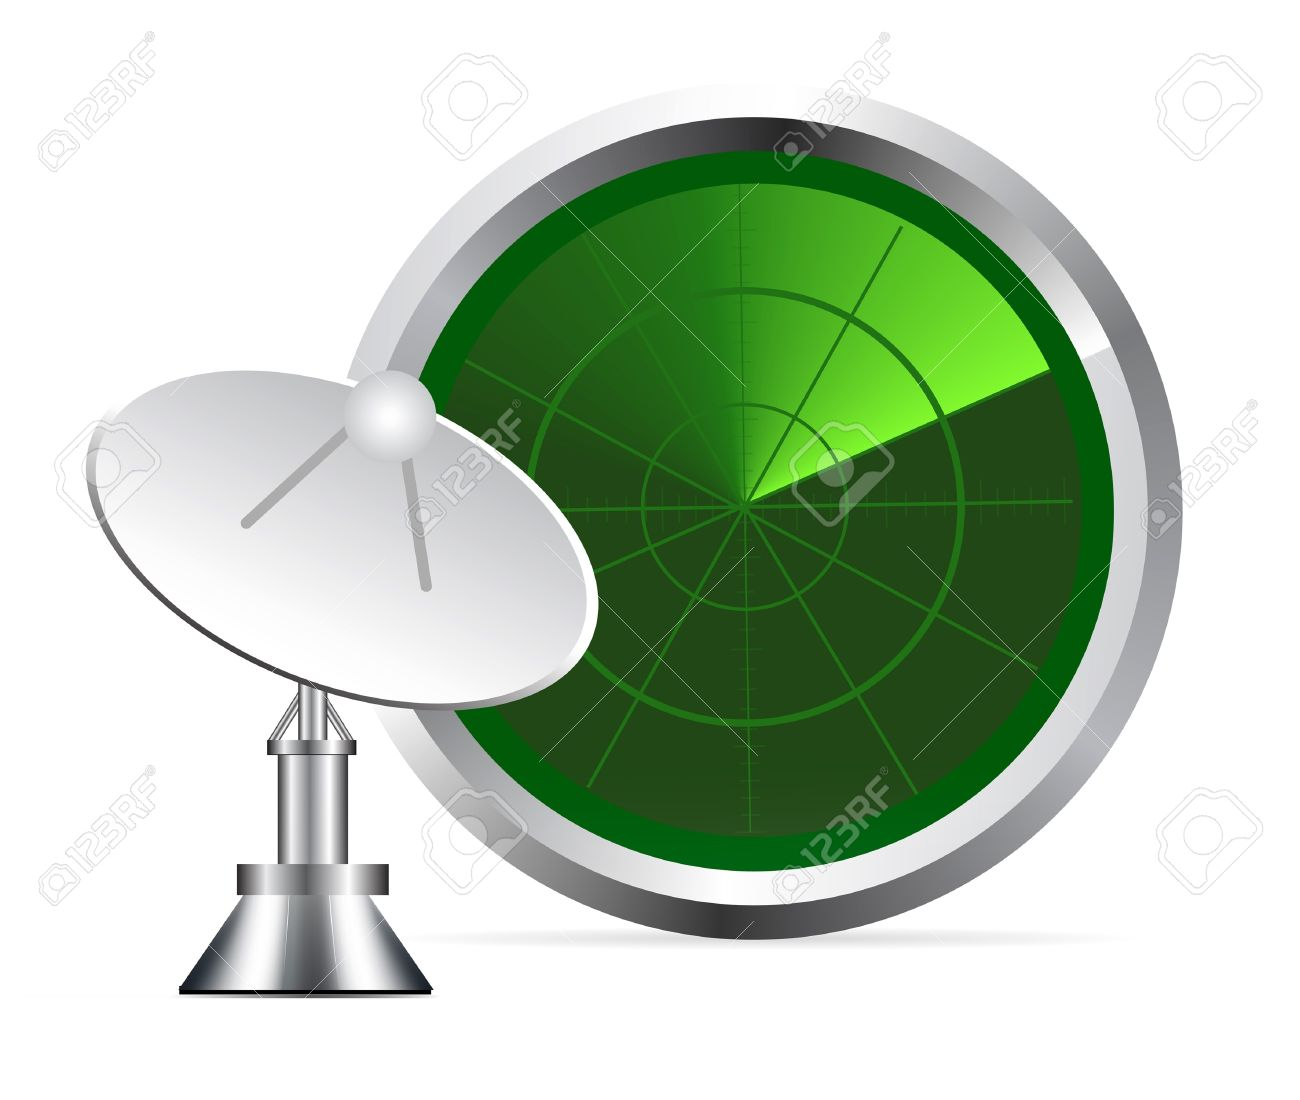 Radar Screen Royalty Free Cliparts, Vectors, And Stock.